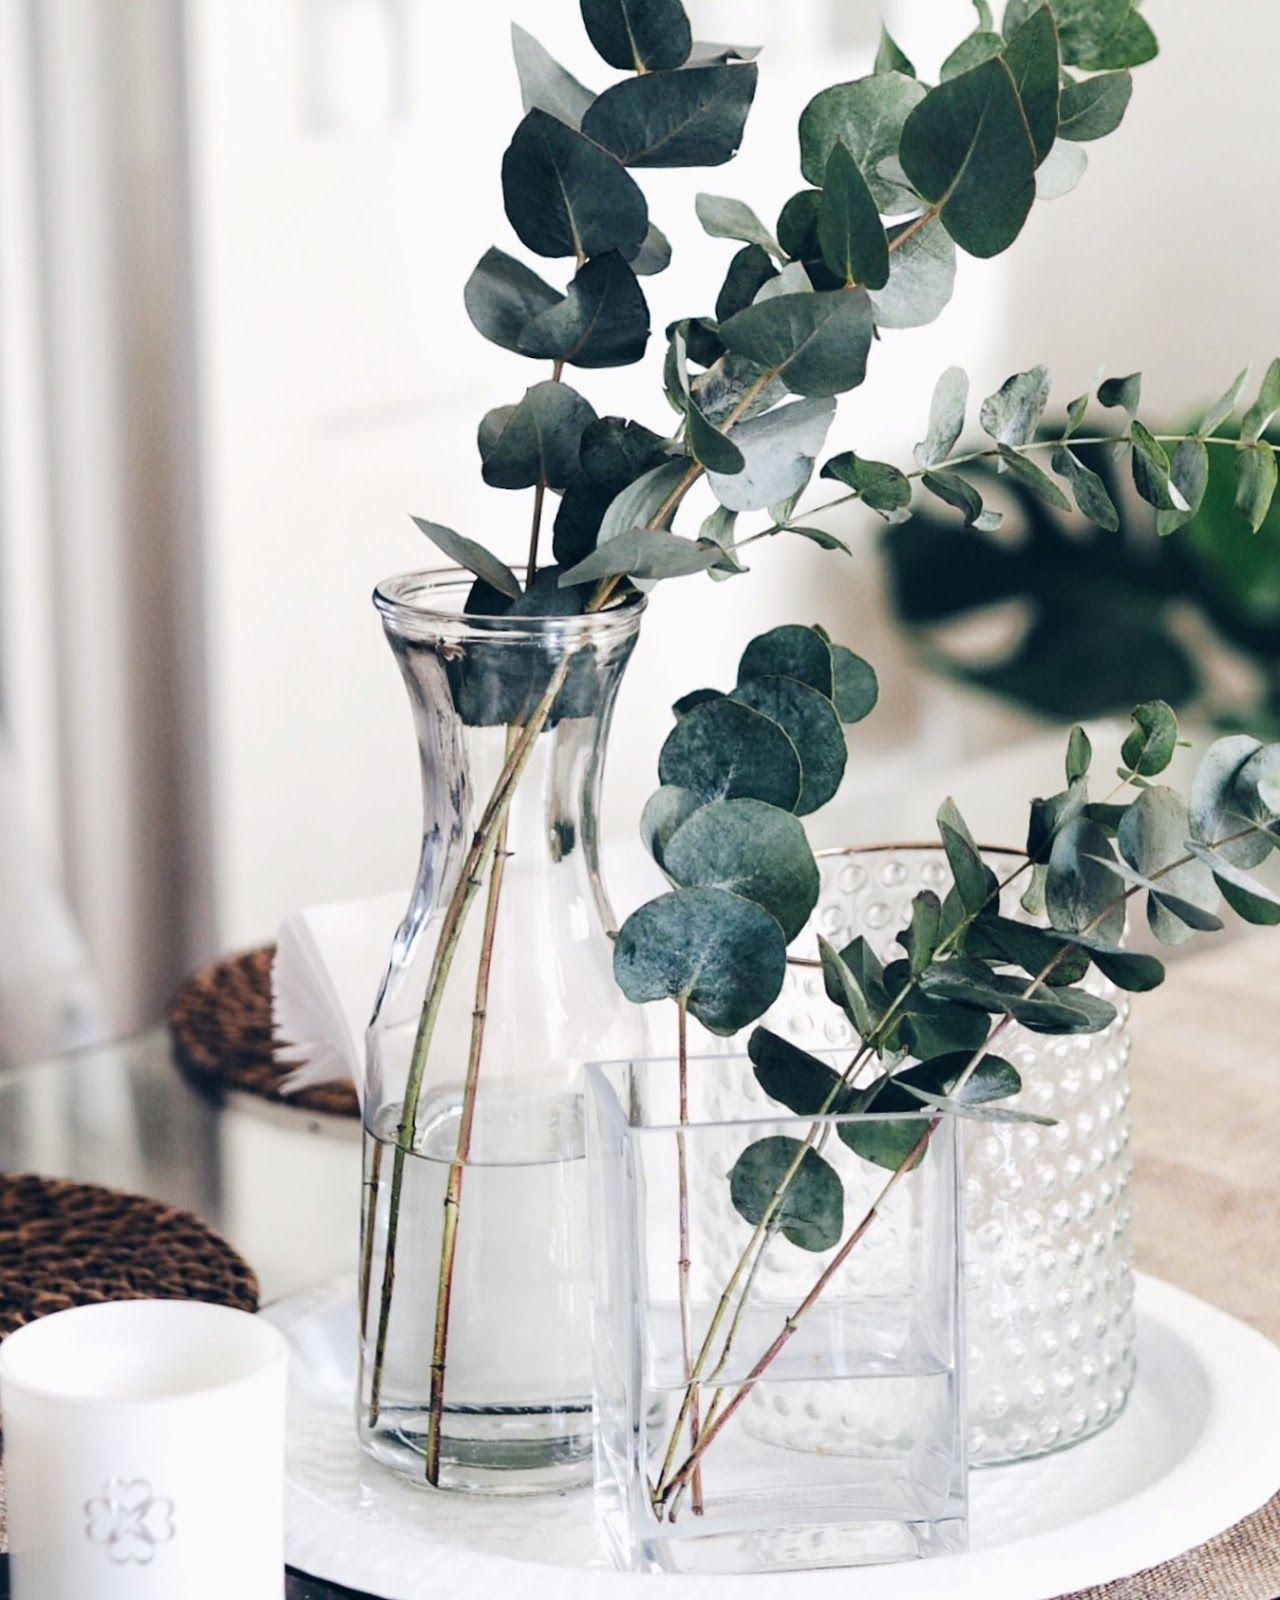 Idee Deco Pour Grand Vase Transparent eucalyptus - trendy interior decor detail | idee deco, deco